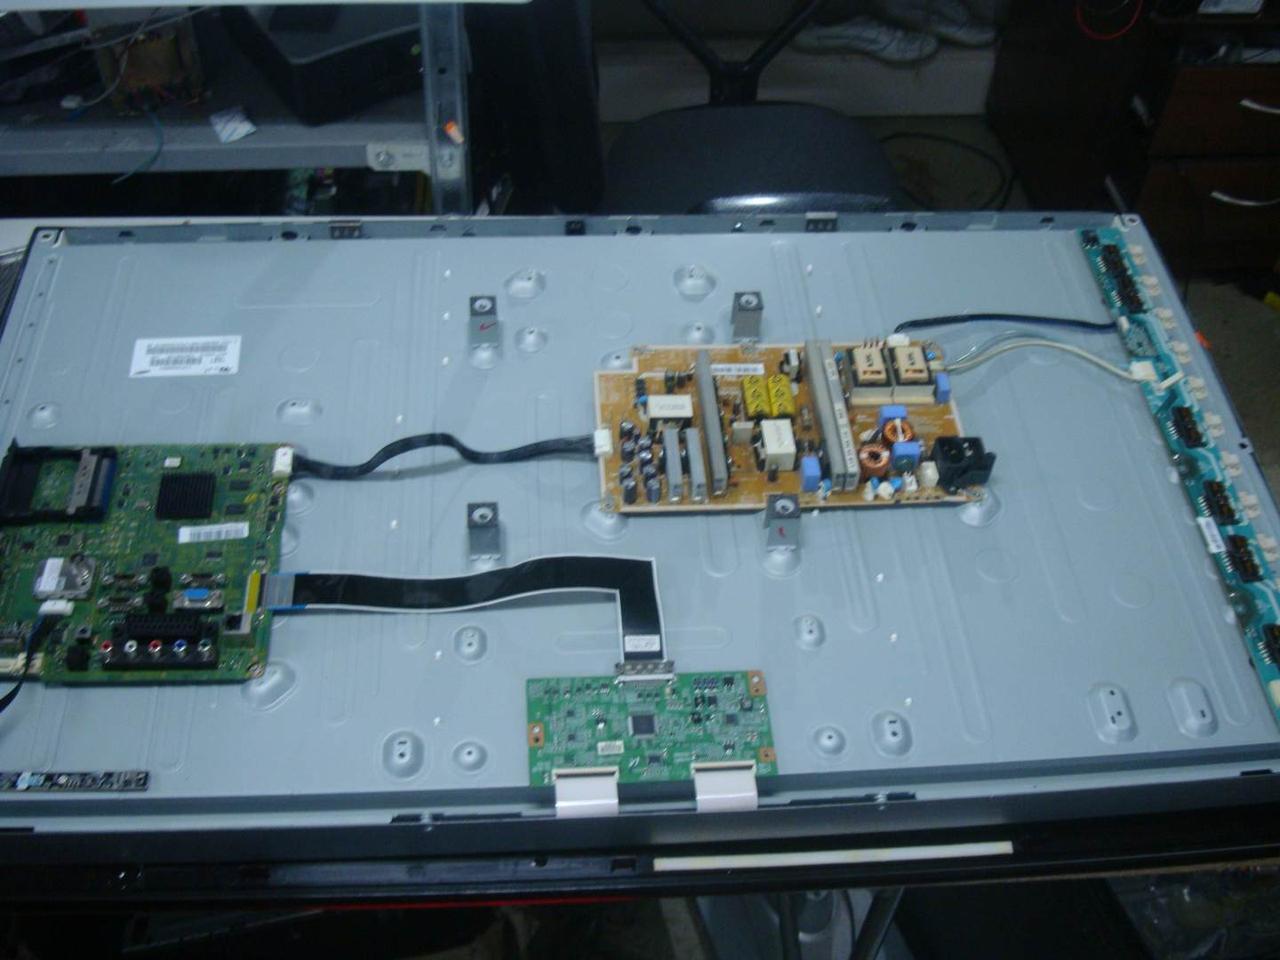 Запчасти к телевизору Samsung LE40C550 (Bn41-01331b, BN44-00340B I40F1_ADY, F60MB4C2LV0.6, SSB400_12V01)